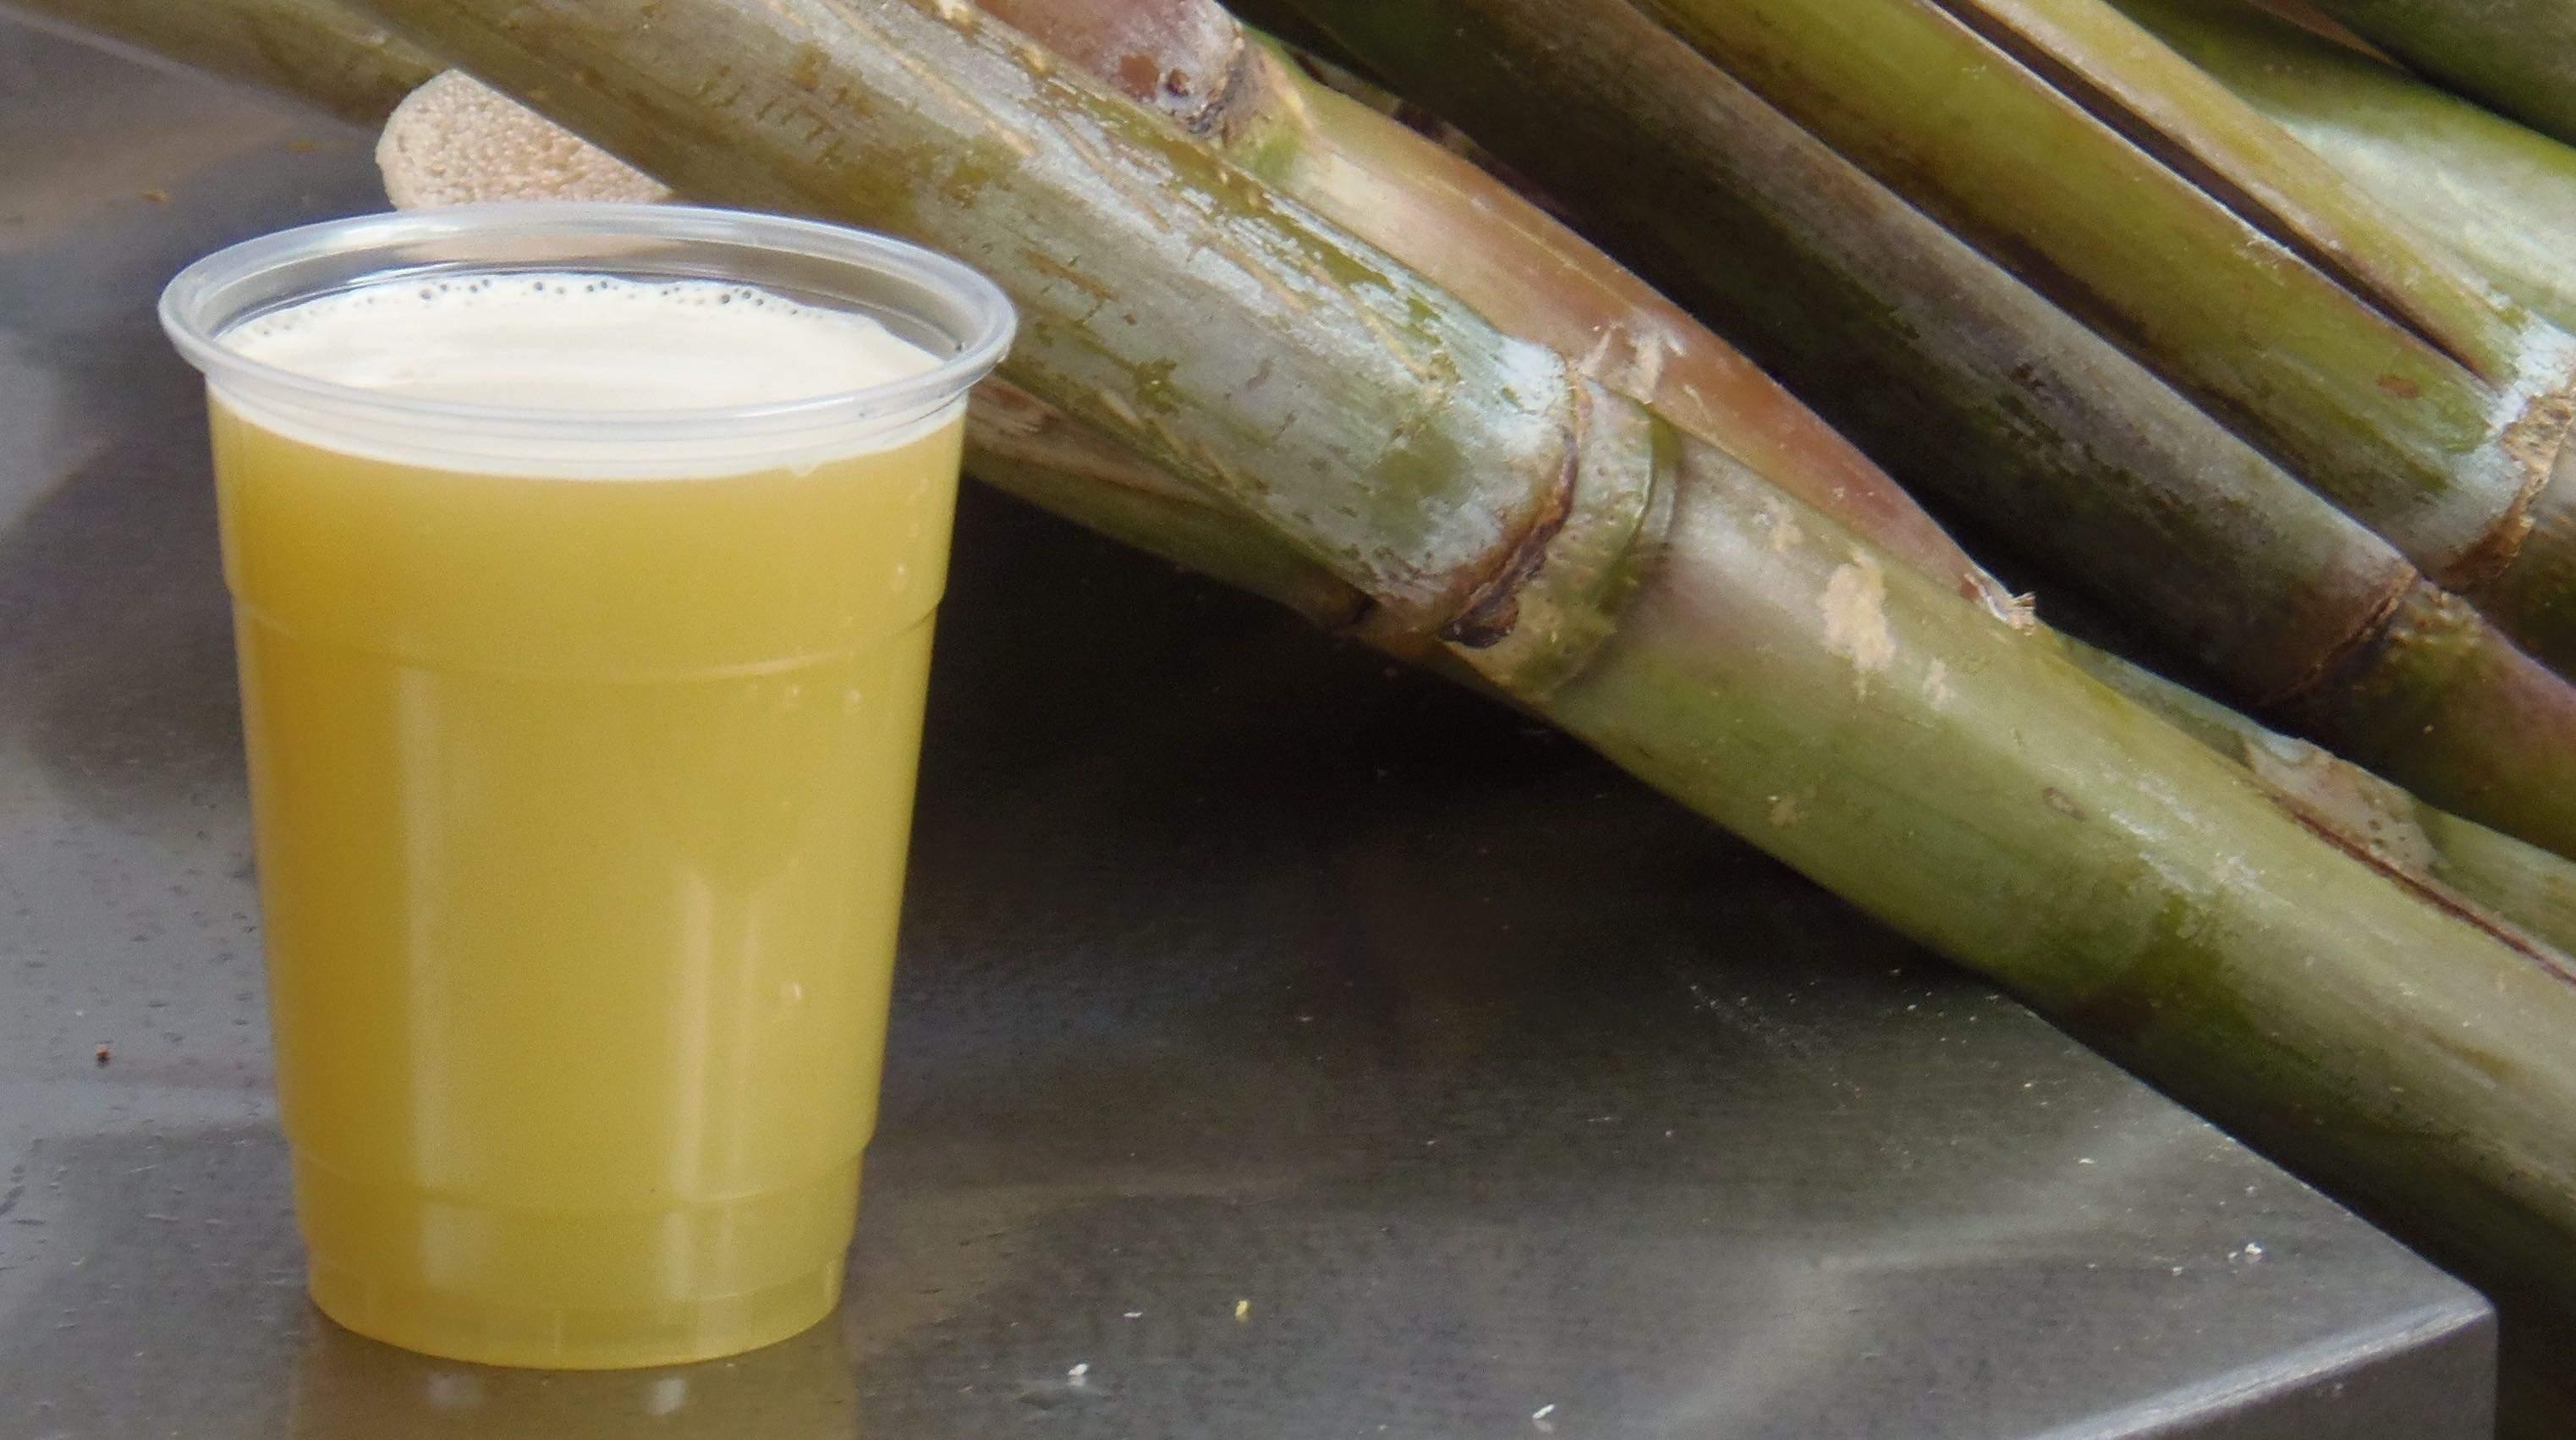 100% Colombian Guarapo (Sugarcane Juice